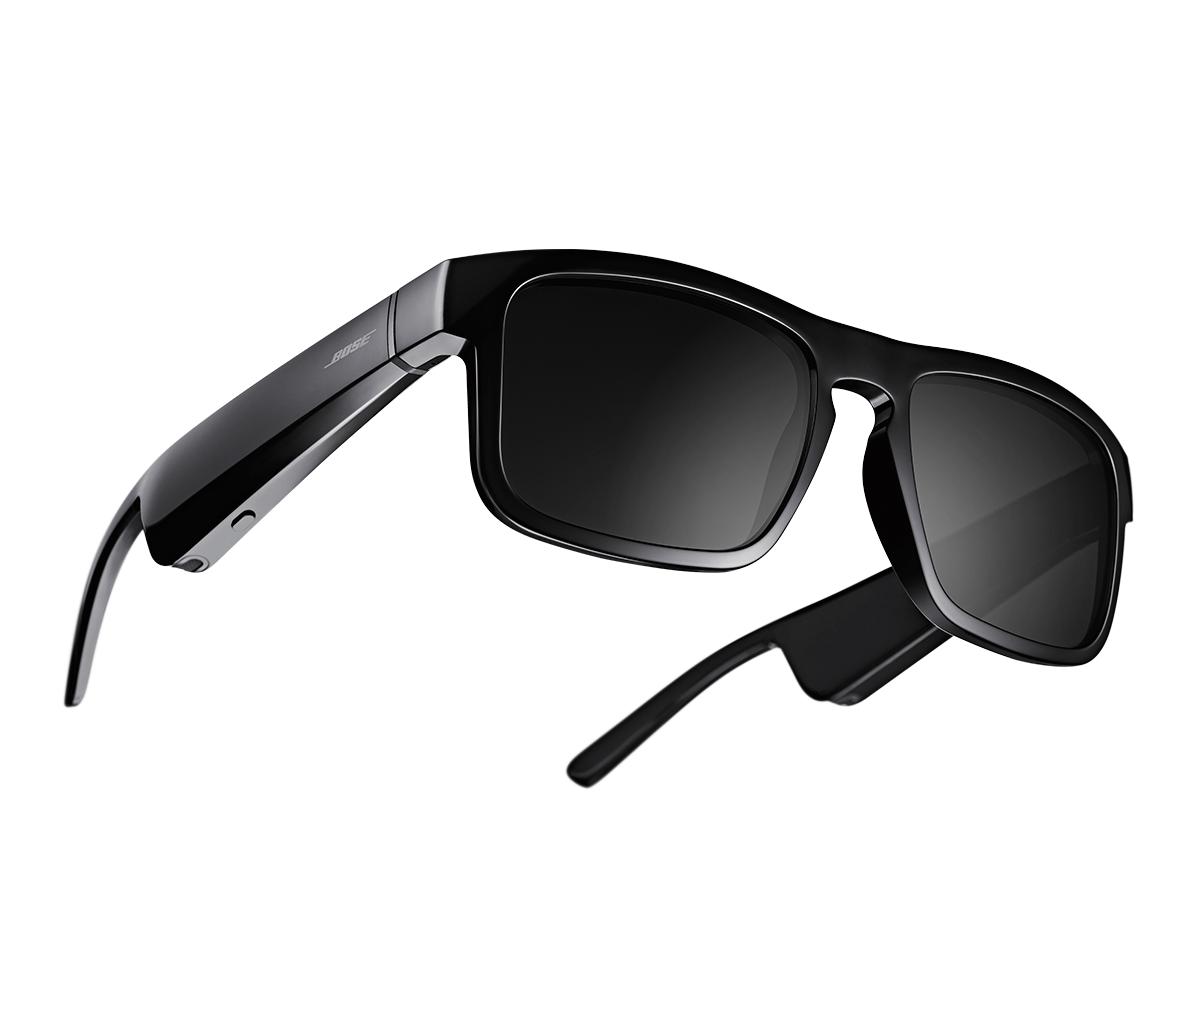 Bose Frames Tenor Black 851338-0110